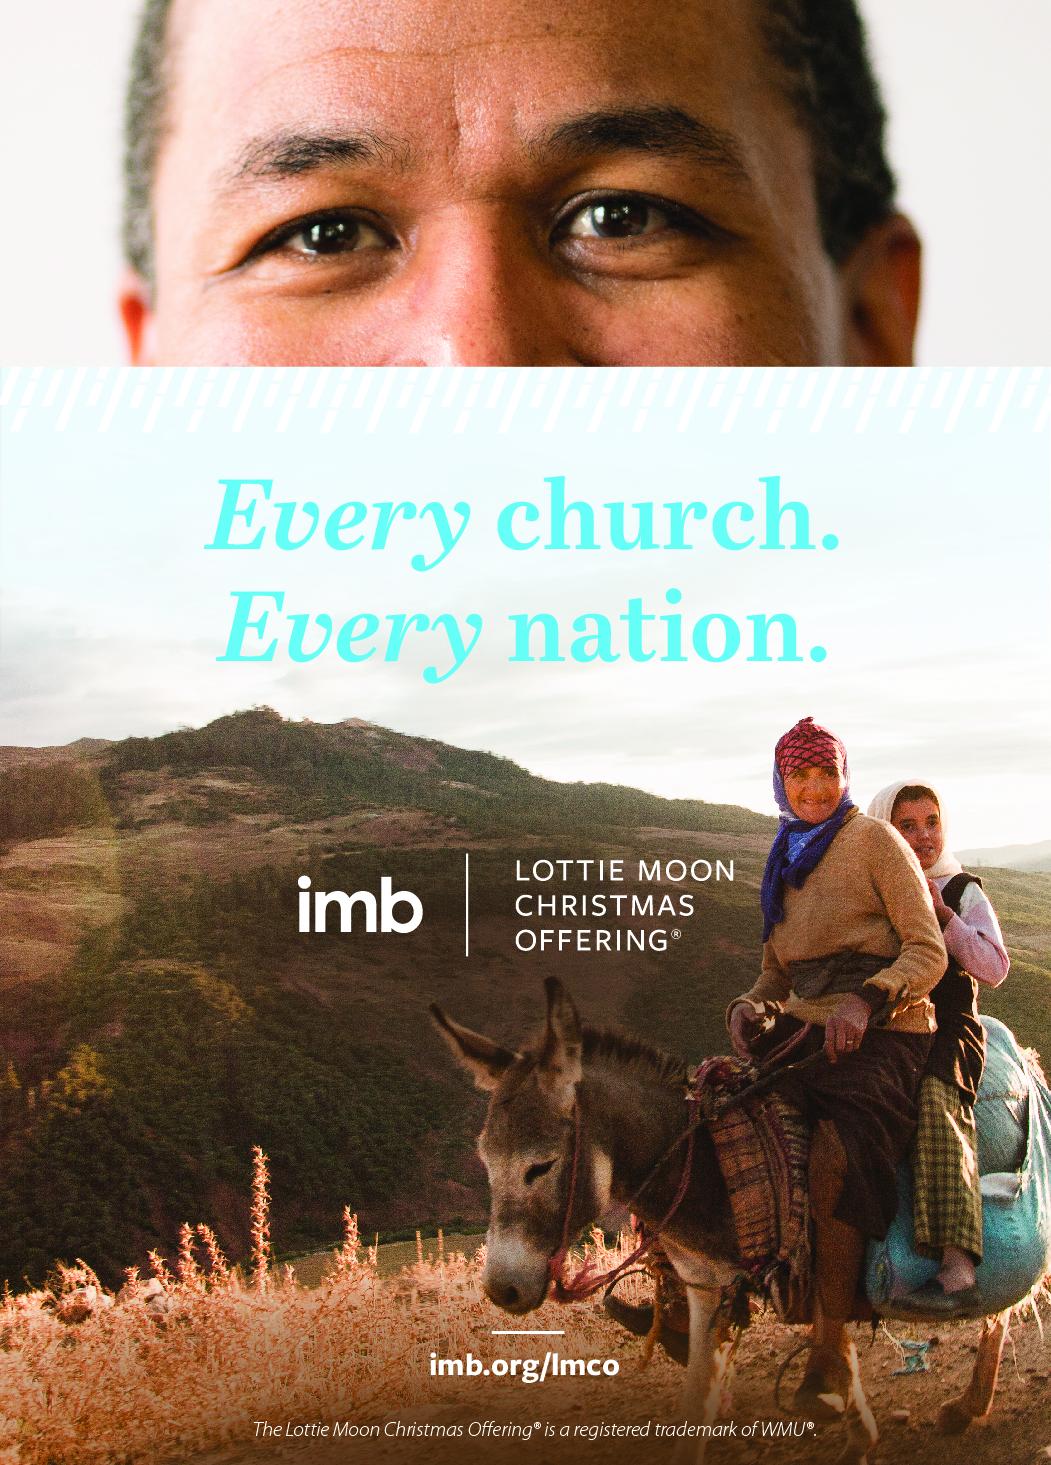 Lottie Moon Christmas Offering magazine ad